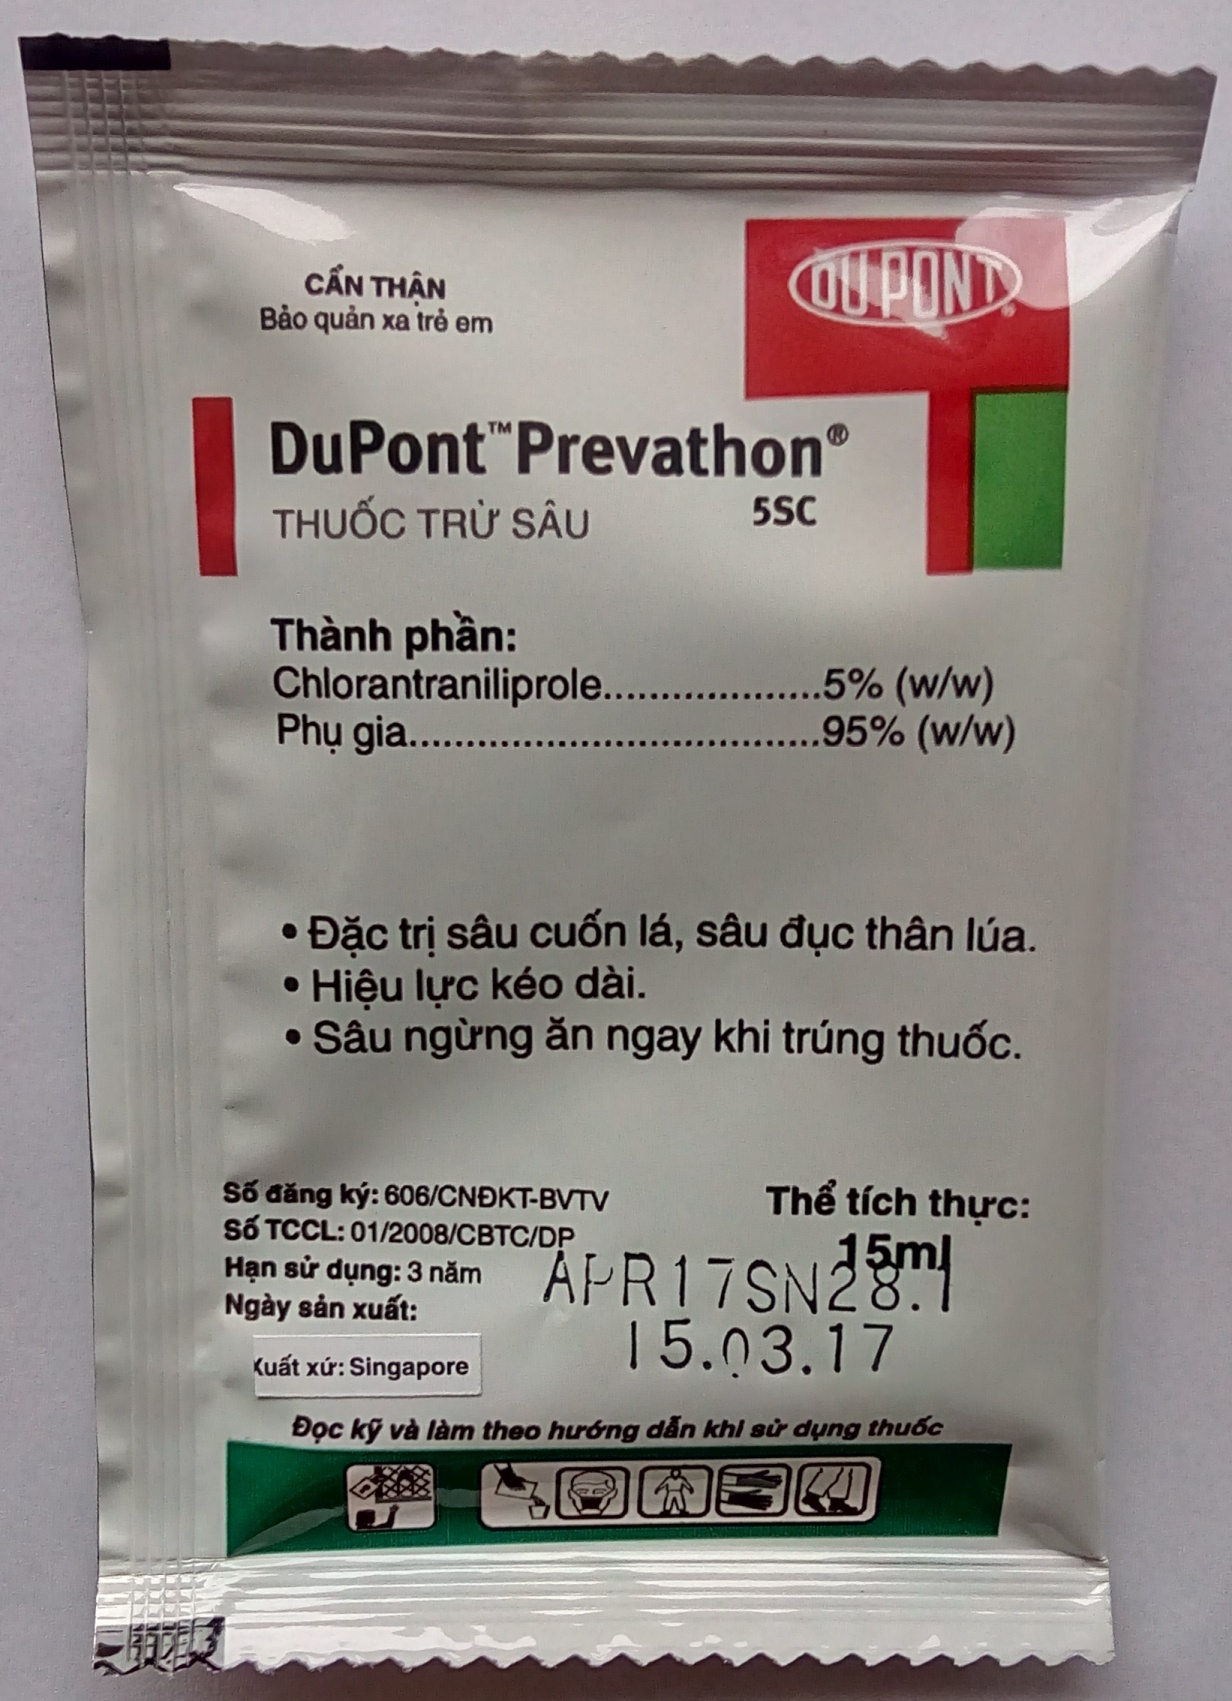 Thuốc trừ sâu sinh học Dupont Prevathon